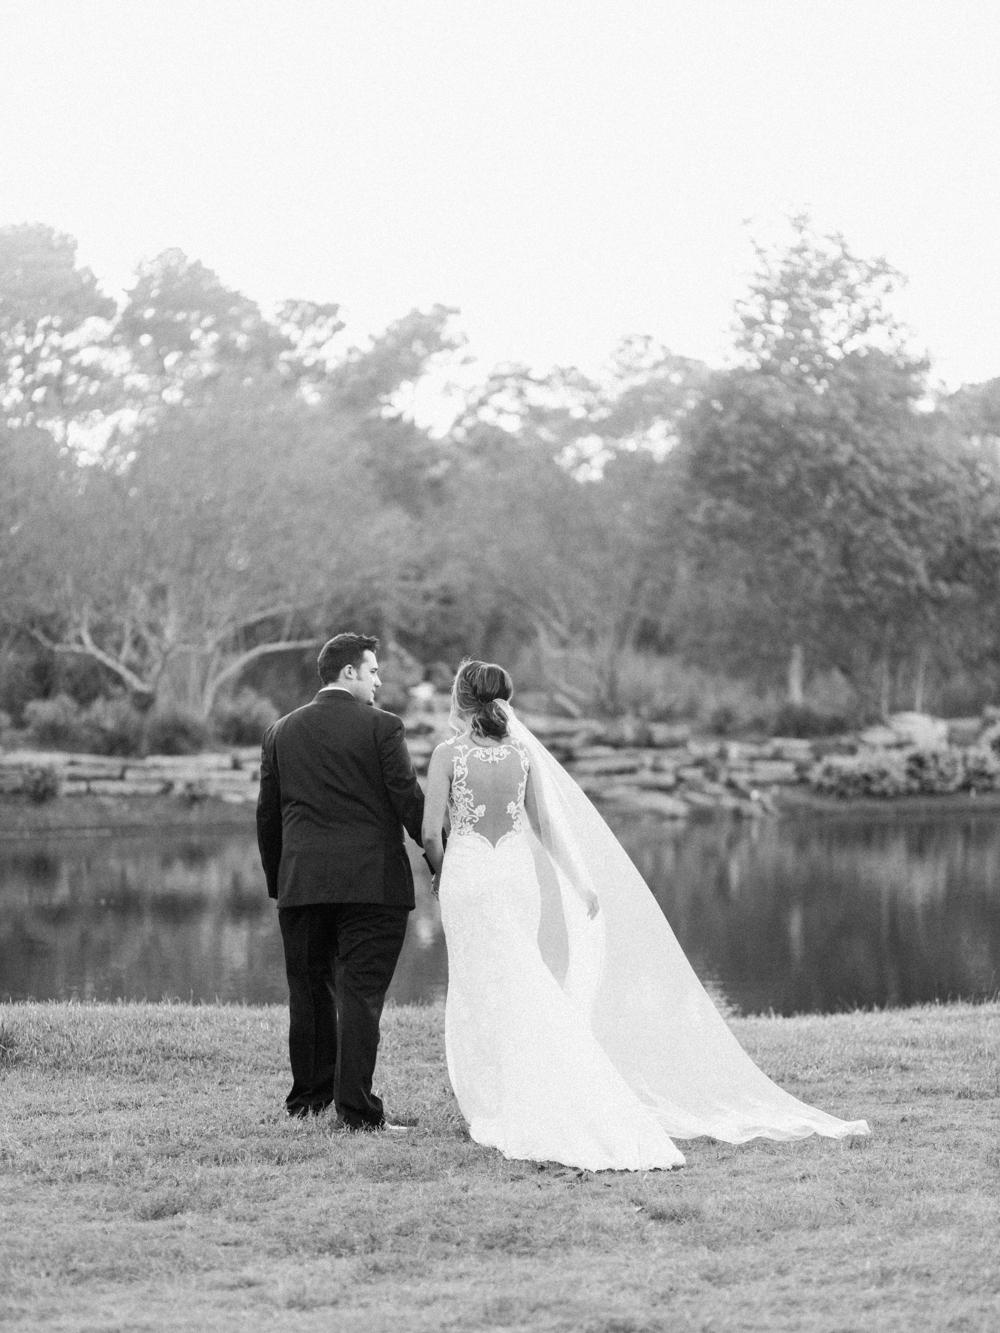 Christine Gosch - destination film photographer - houston wedding photographer - fine art film photographer - elopement photographer - destination wedding - understated wedding - simple beautiful wedding photography-143.jpg